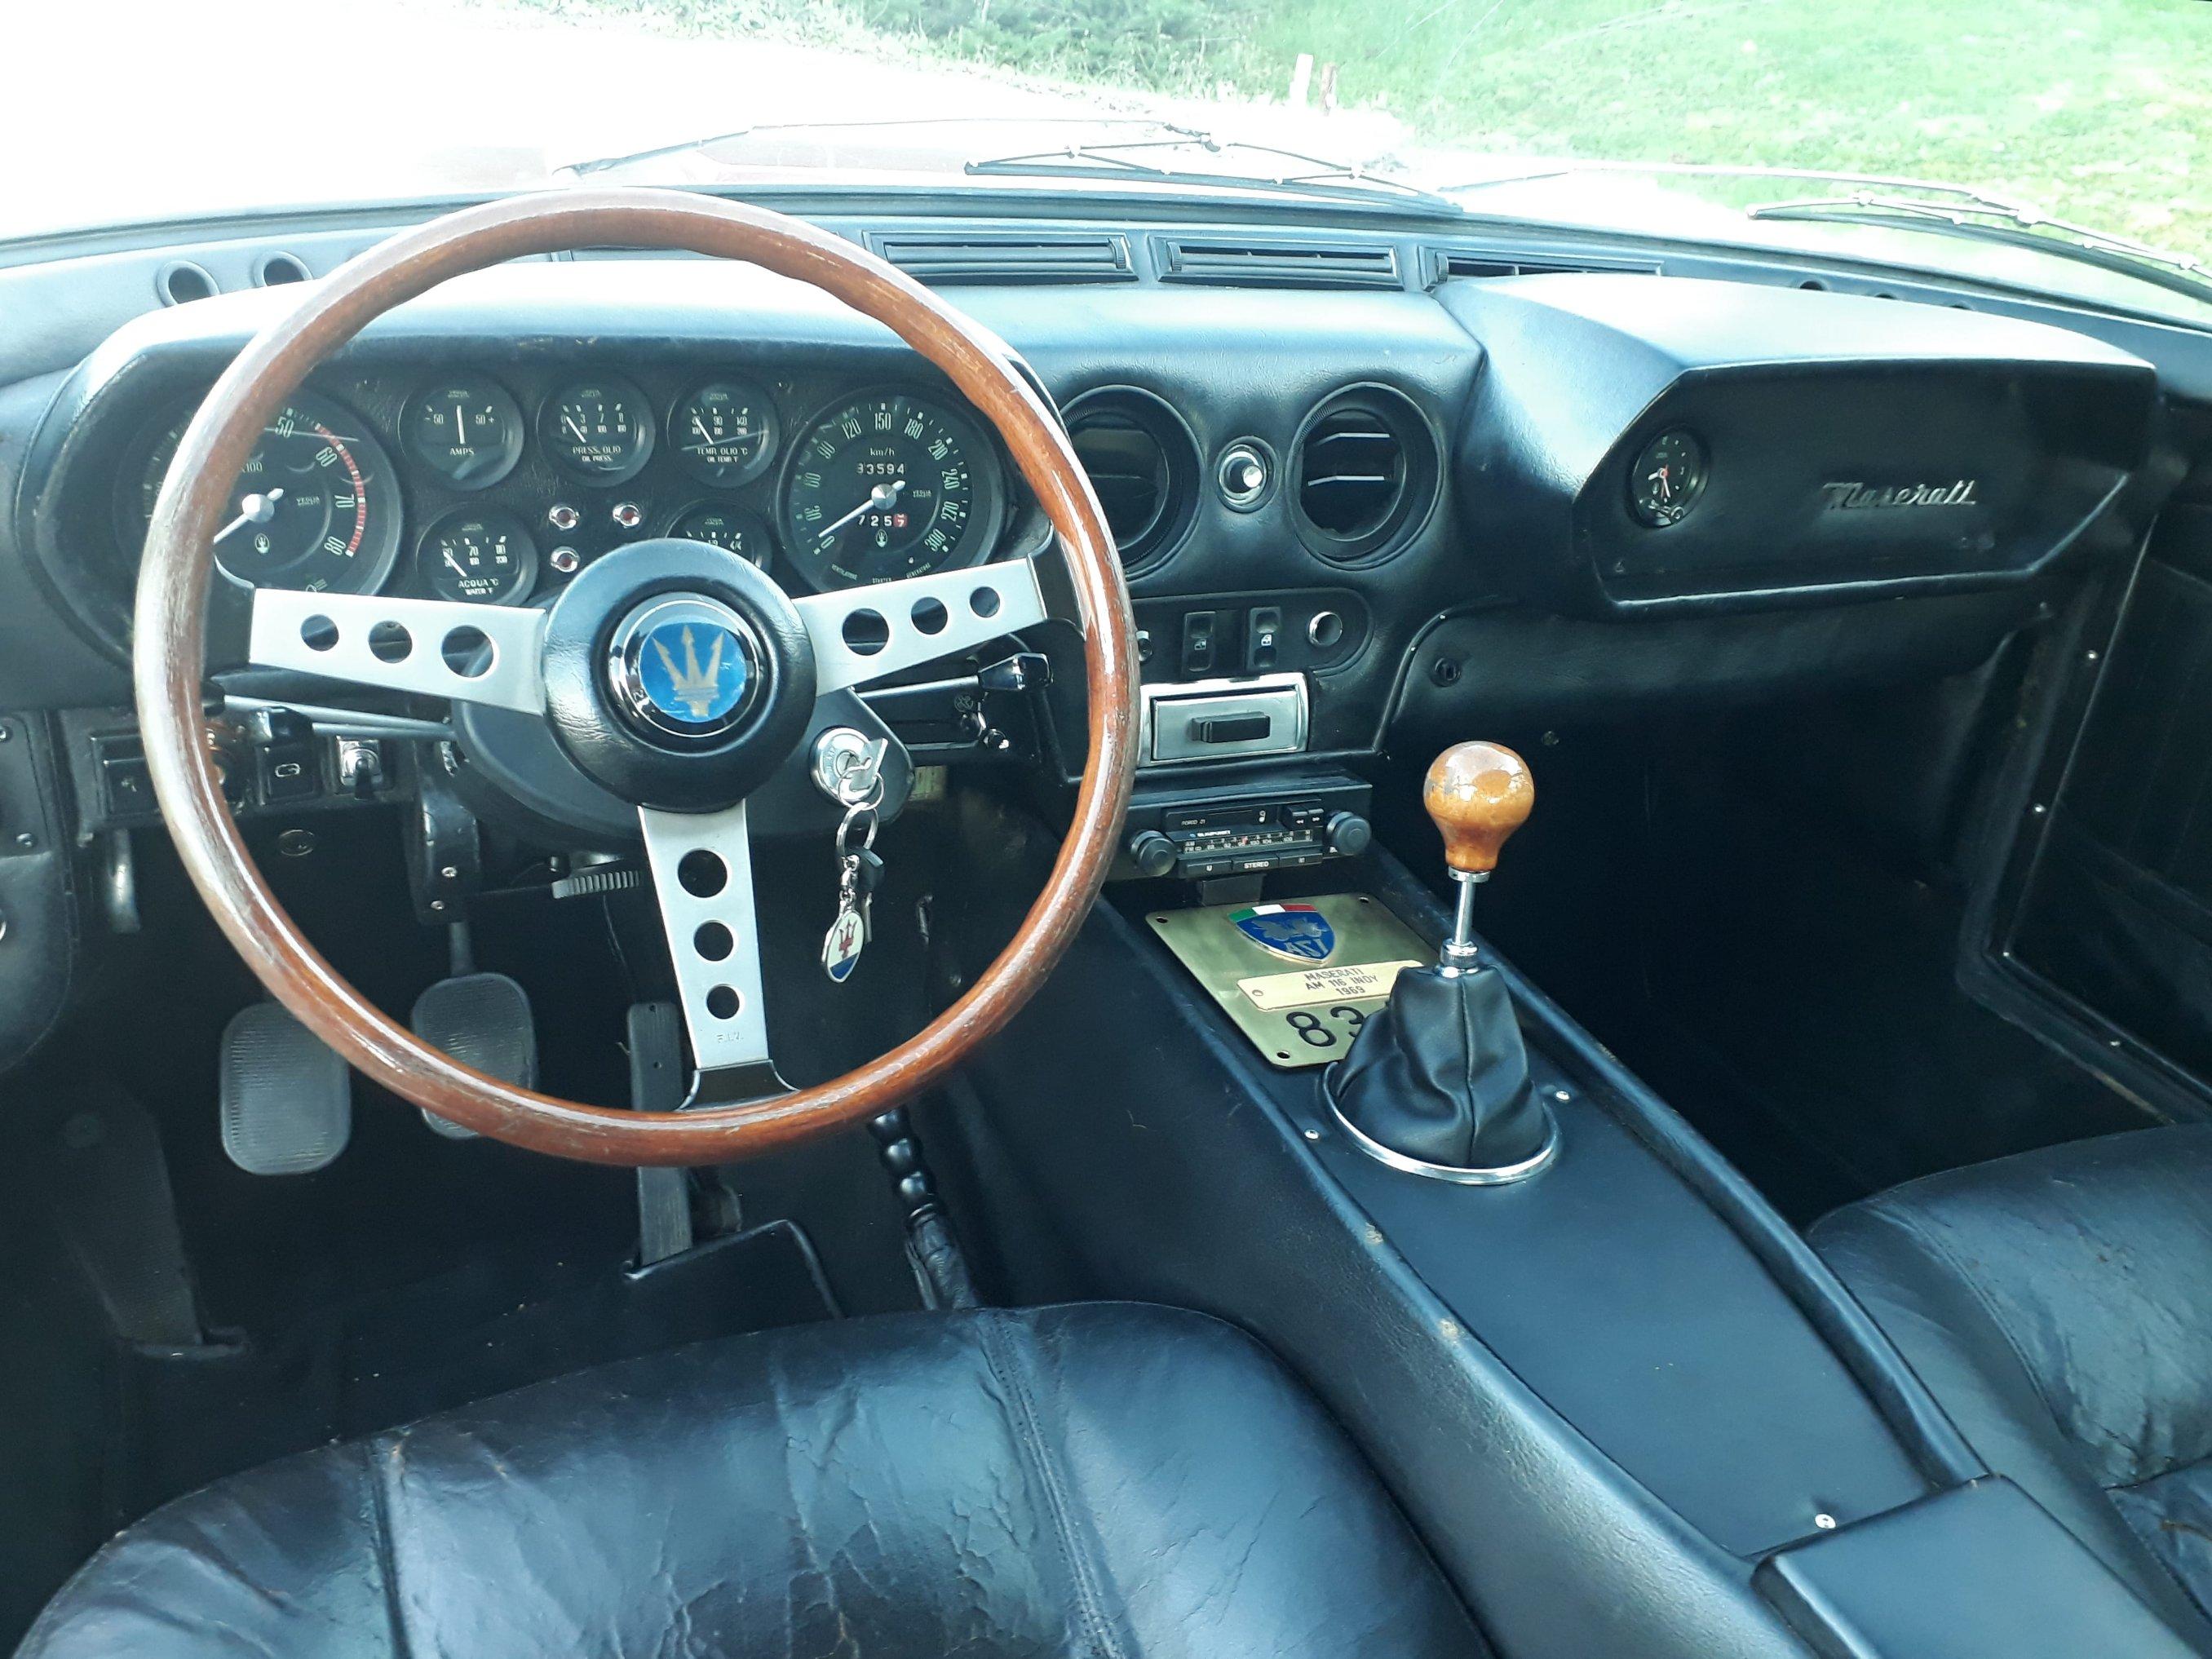 Maserati Indy 4200cc - Manual - Shmoo Automotive - TVR Sports Cars